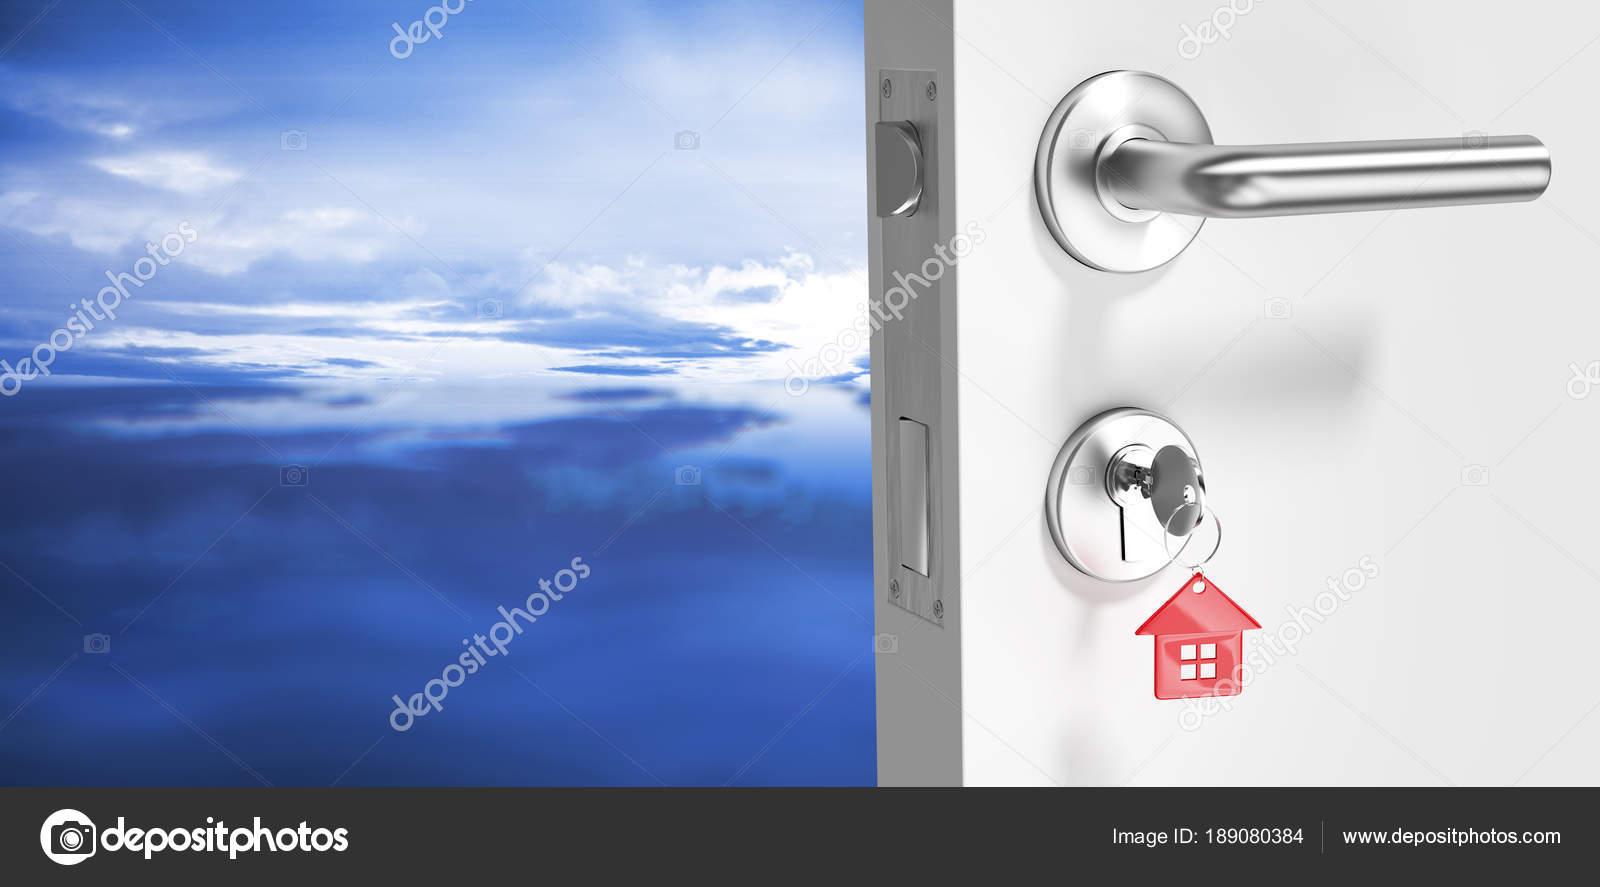 Digitally Generated Image Open Door House Key Blue Sky Blue